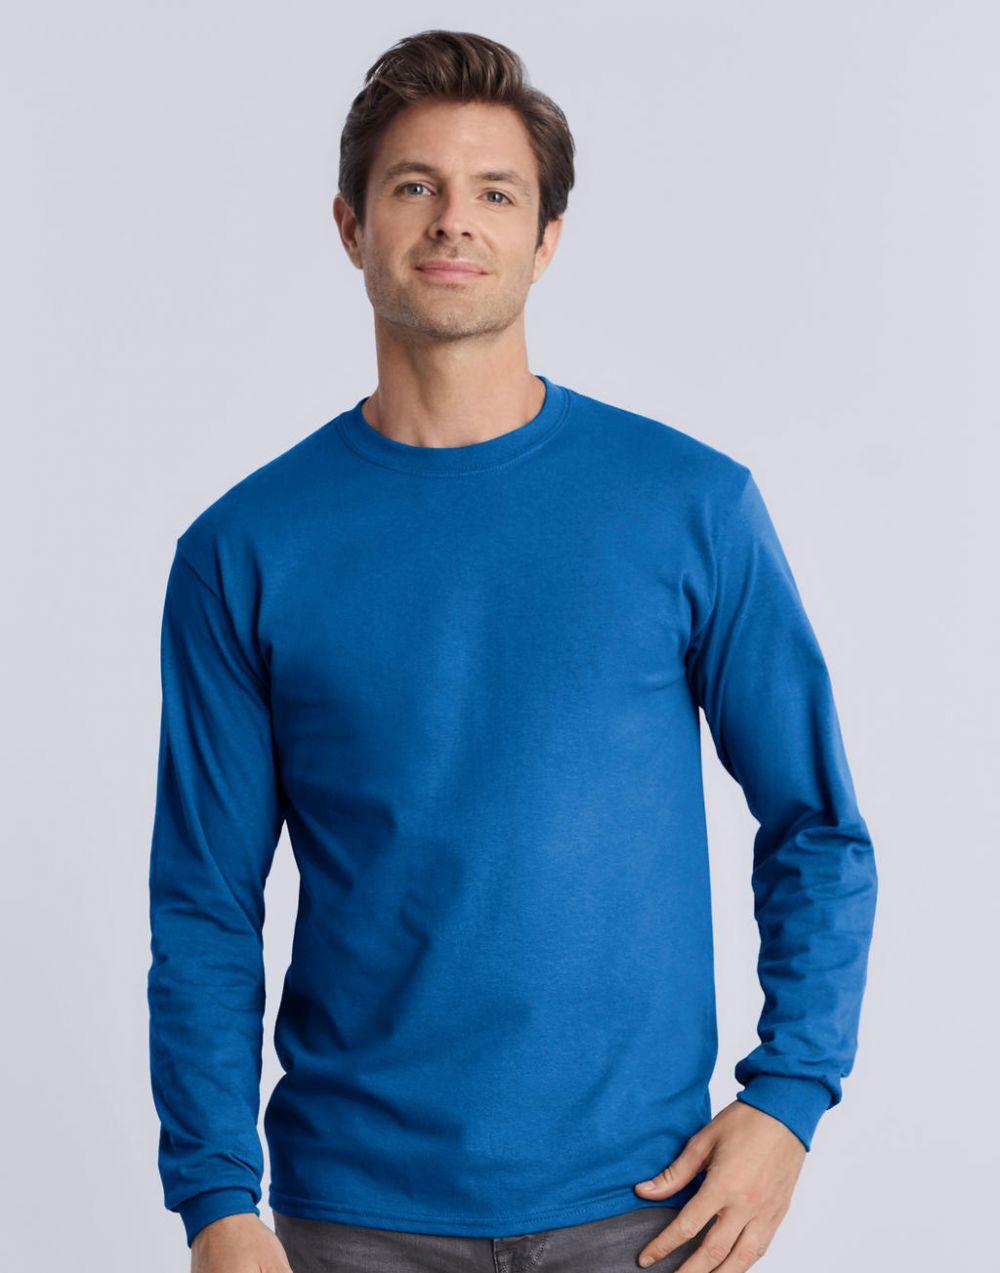 Camisetas manga larga gildan ultra manga larga hombre con logo vista 1